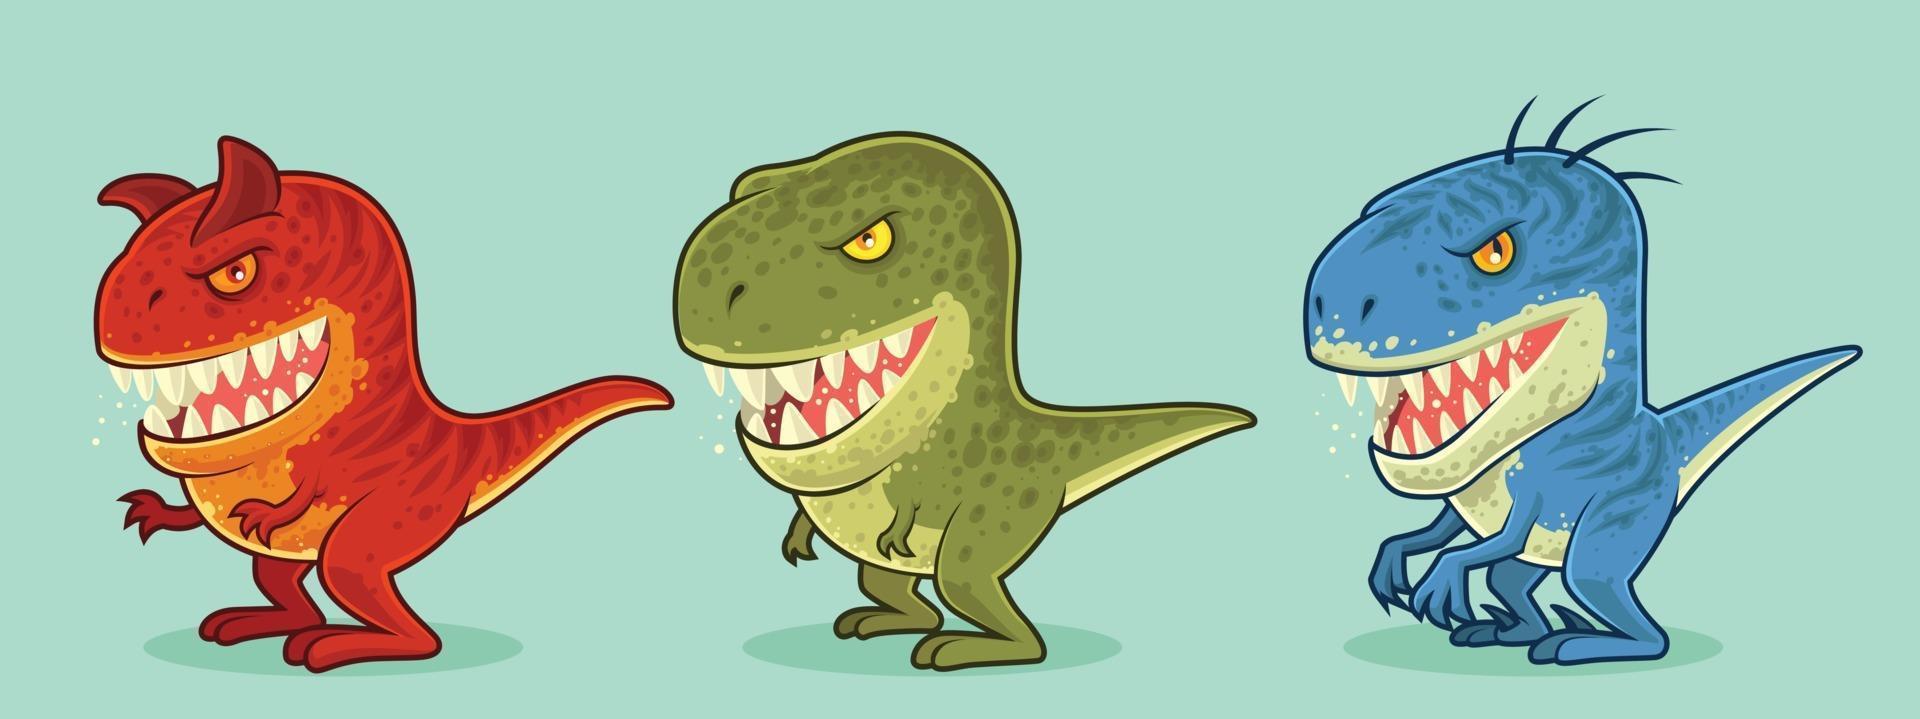 niedlicher Dinosauriercharakter vektor